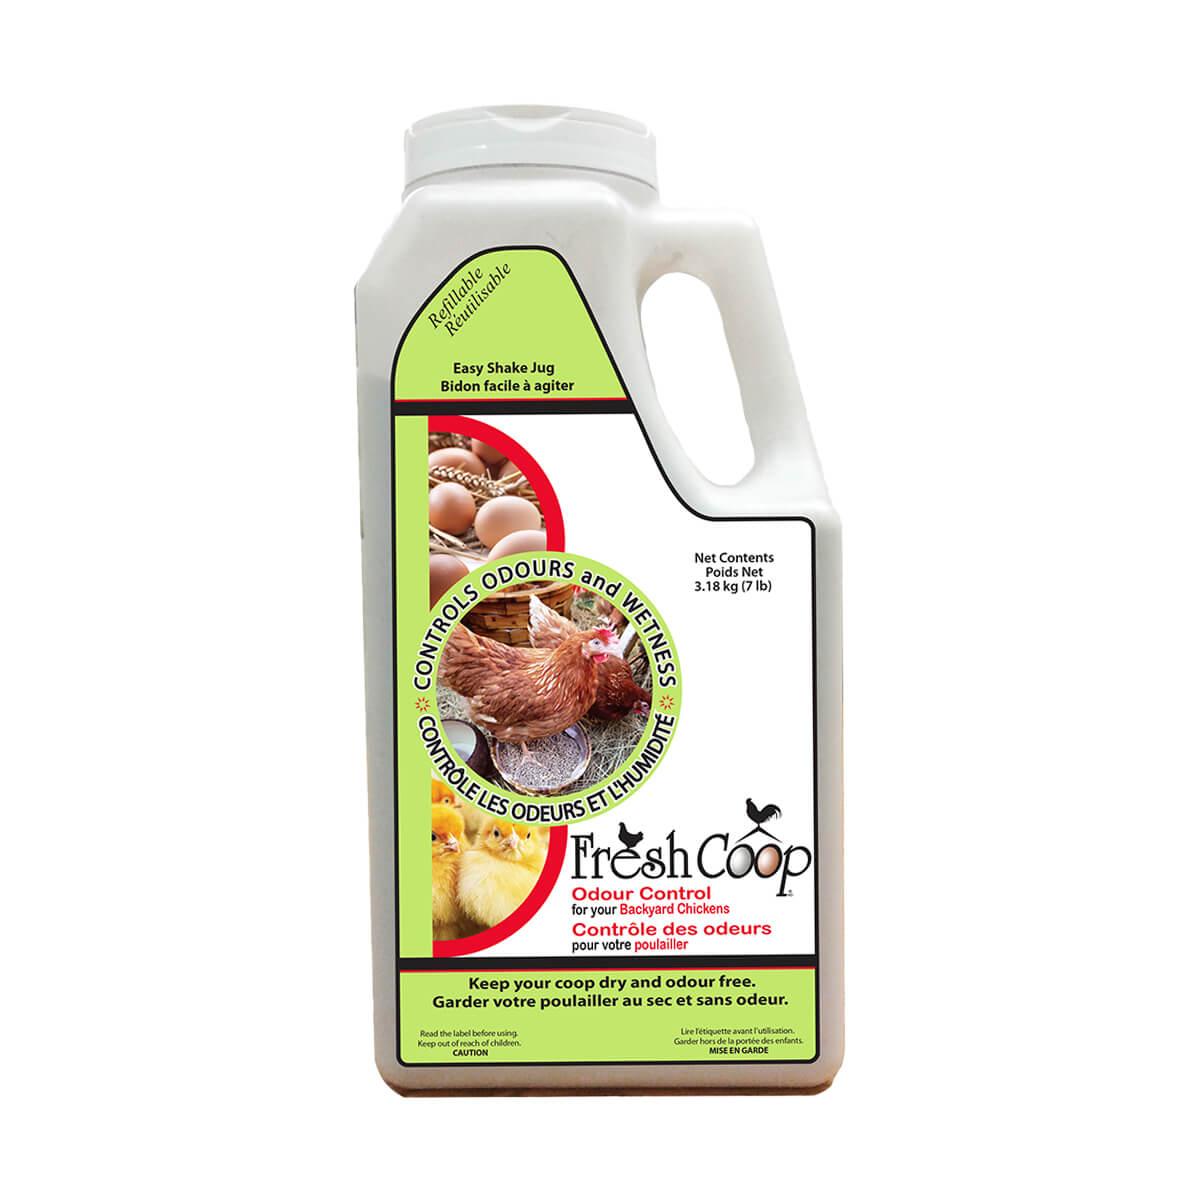 Fresh Coop Poultry Deodorizer - Odour Control - 7lb